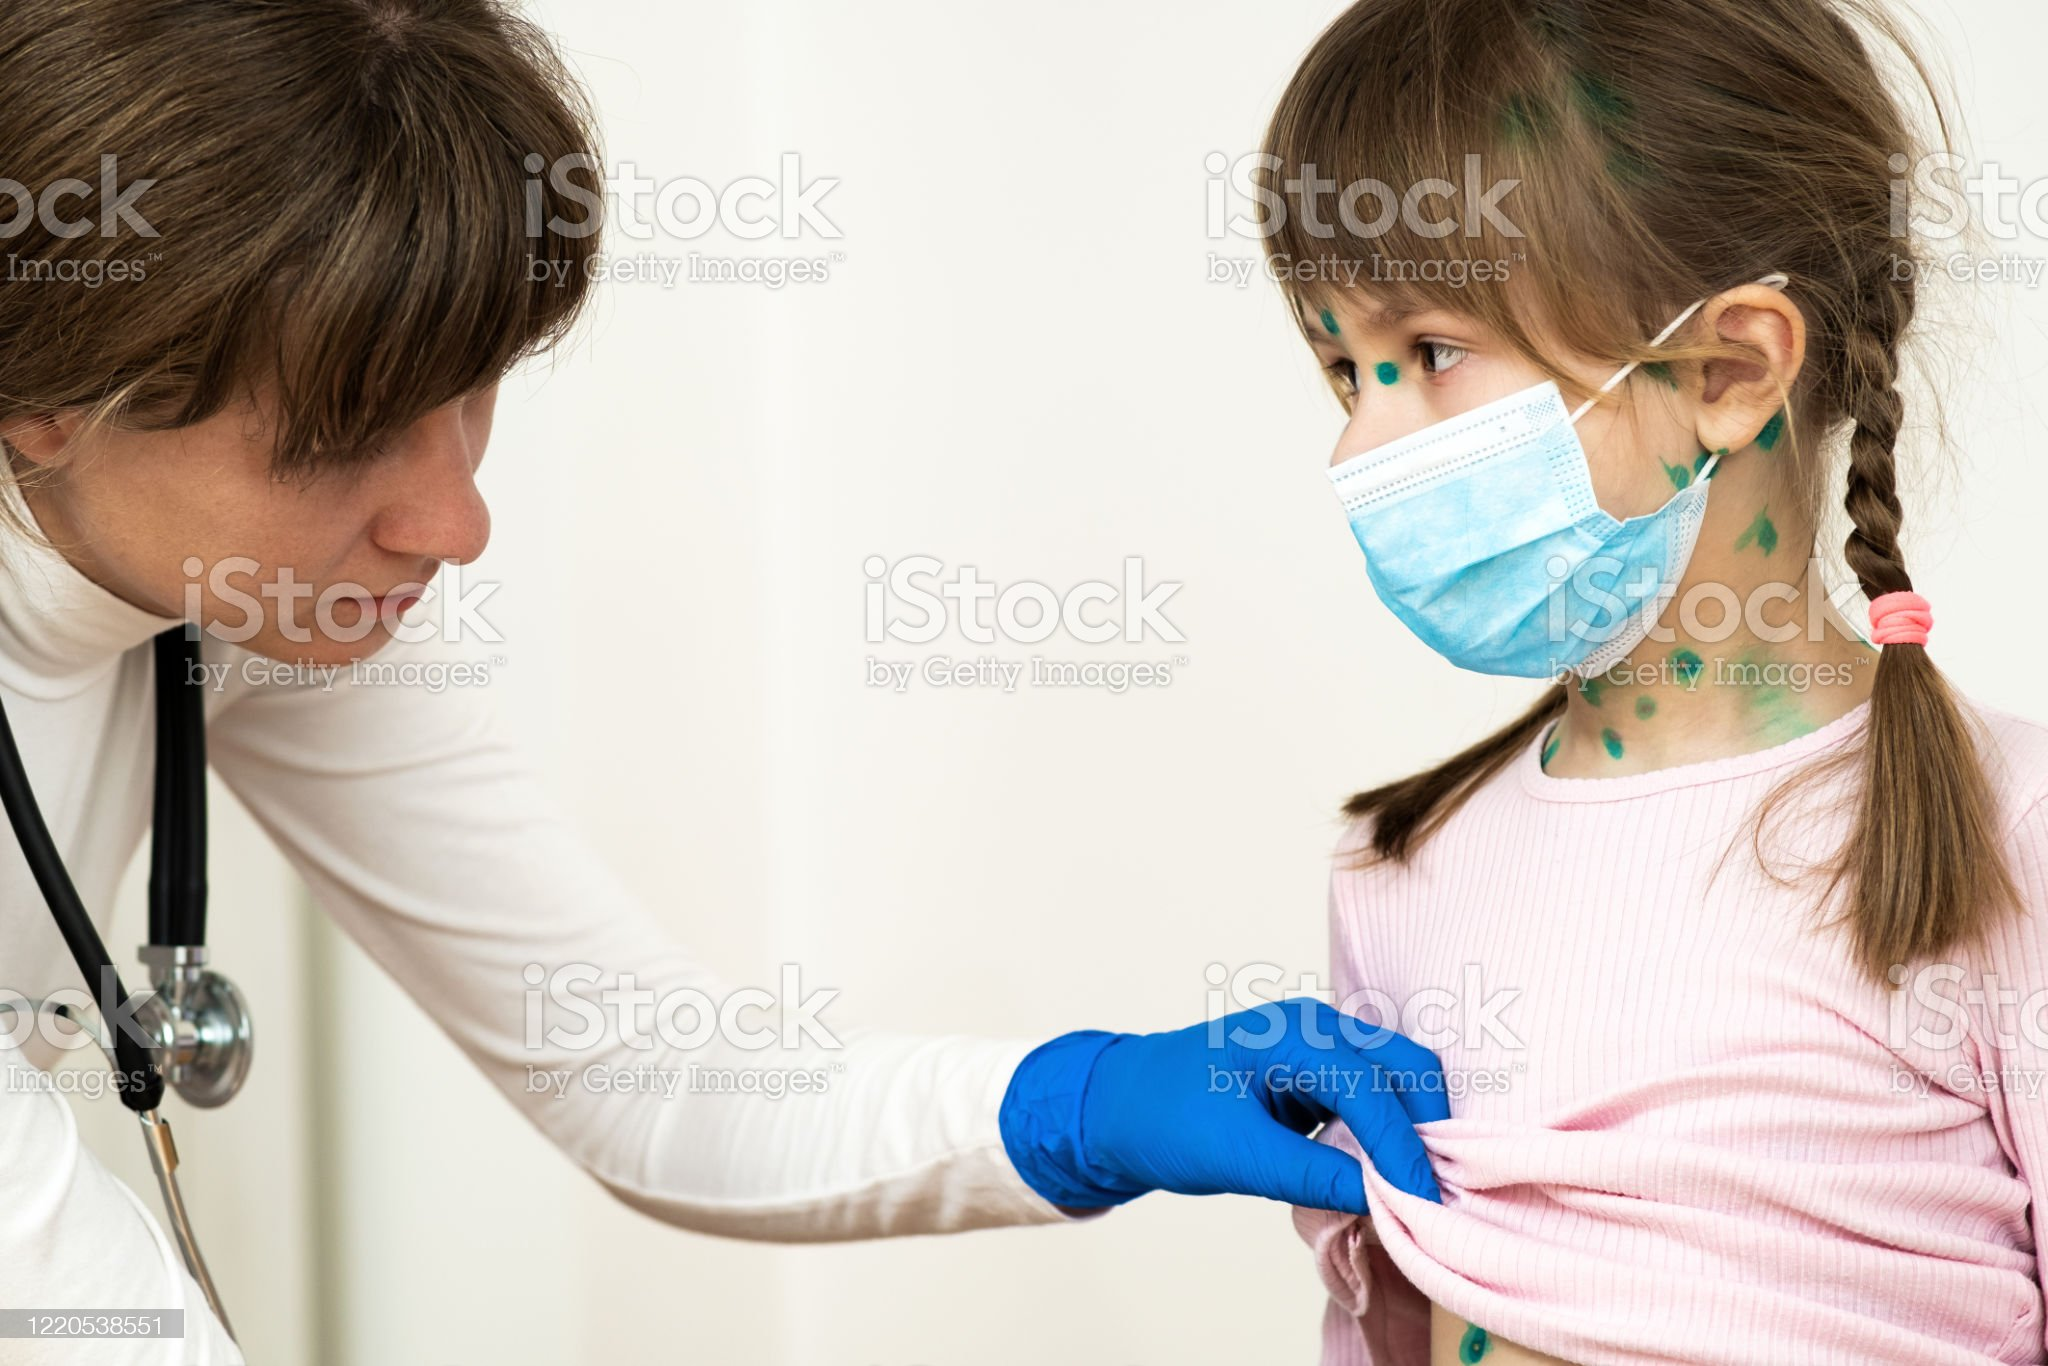 Doctor Radiologist Examining Xray High-Res Stock Photo